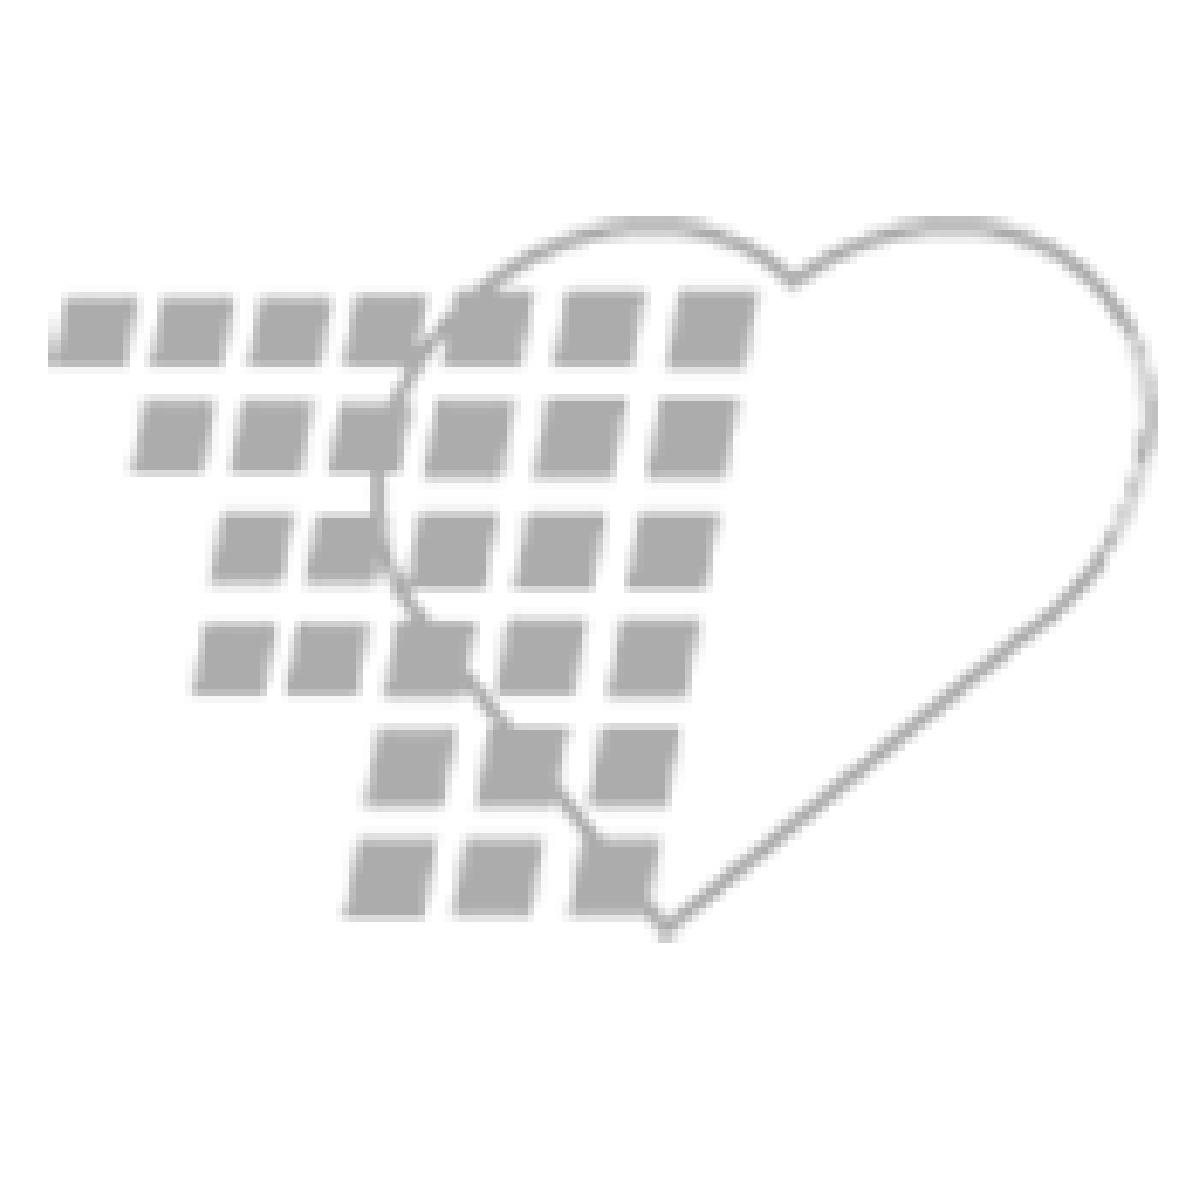 06-31-1103-BLU - ChemoPlus   Blue IVA Seals